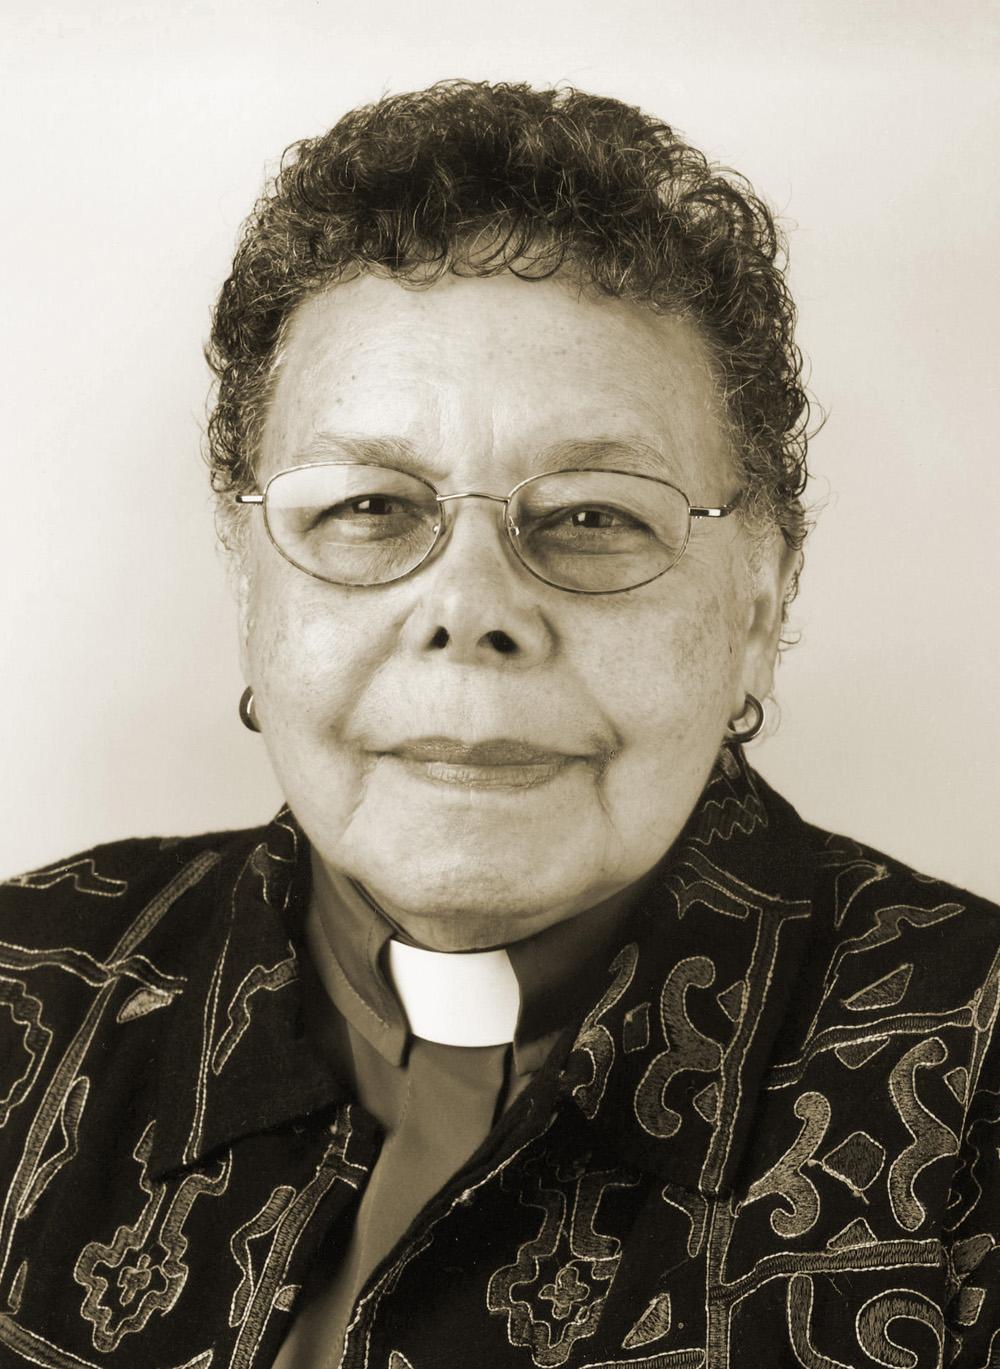 United Methodist Bishop Leontine Turpeau Current Kelly. Sepia photo by Mike DuBose, UM News.